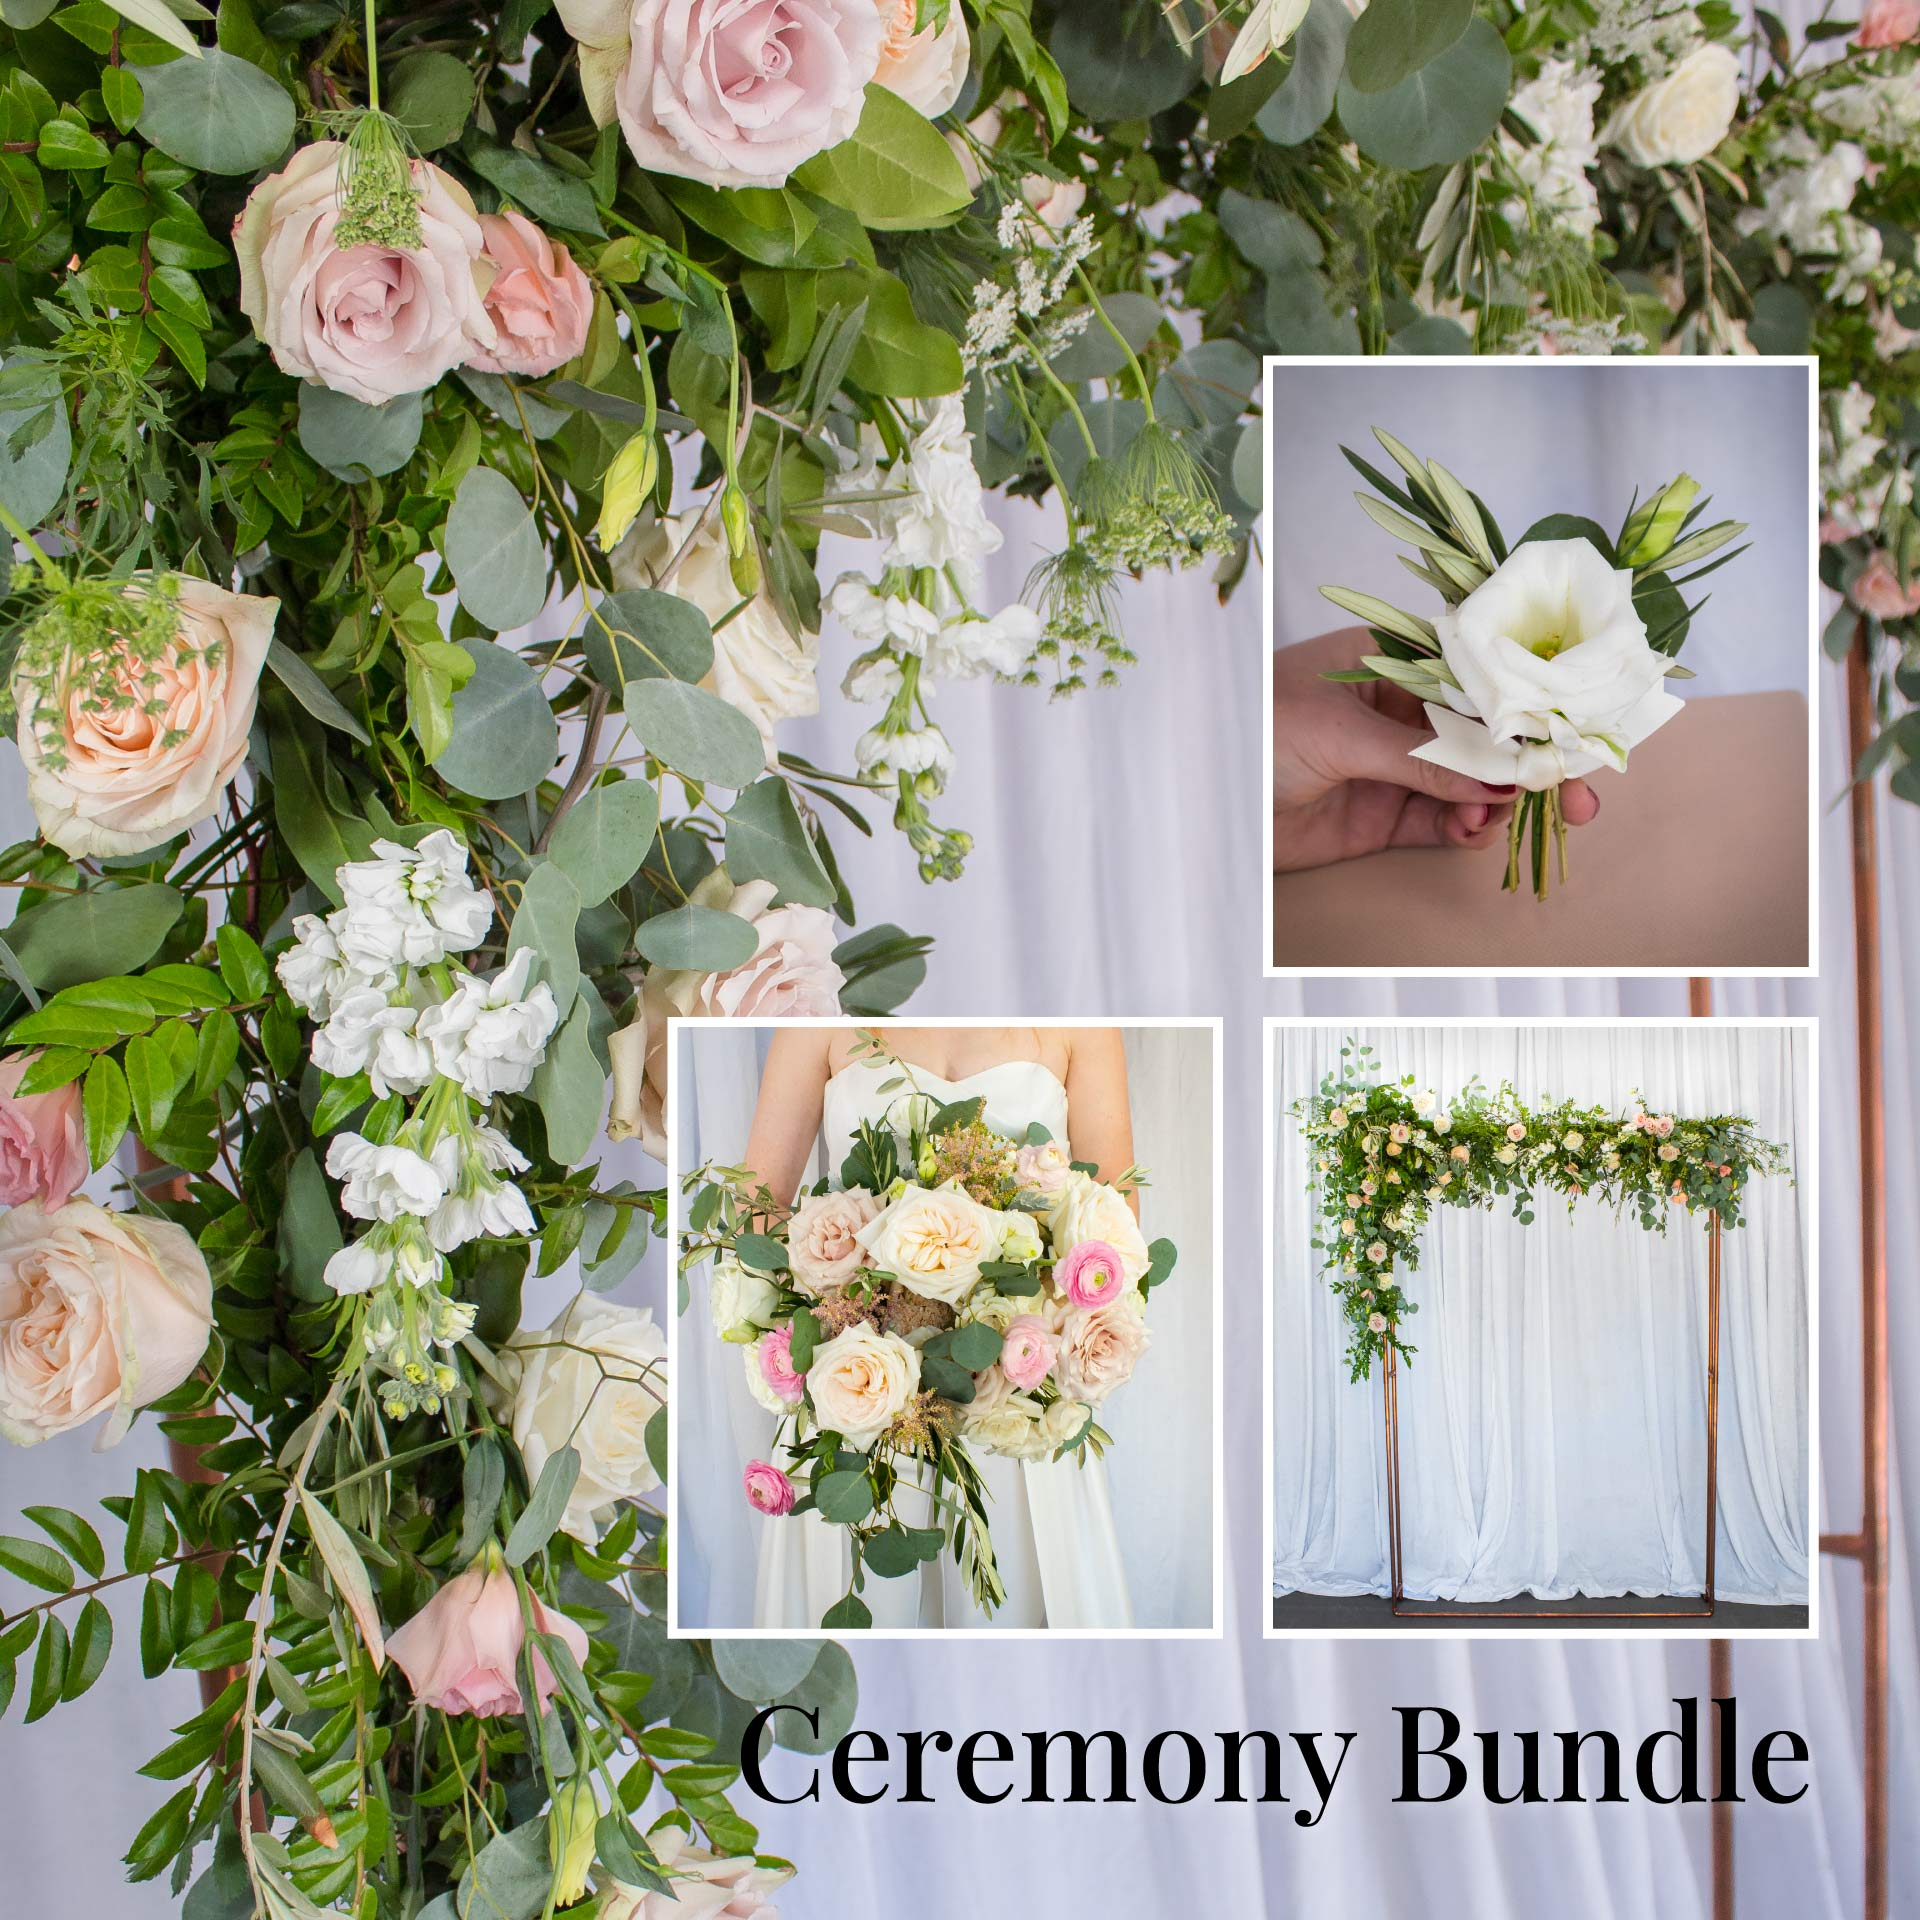 Ceremony Bundle